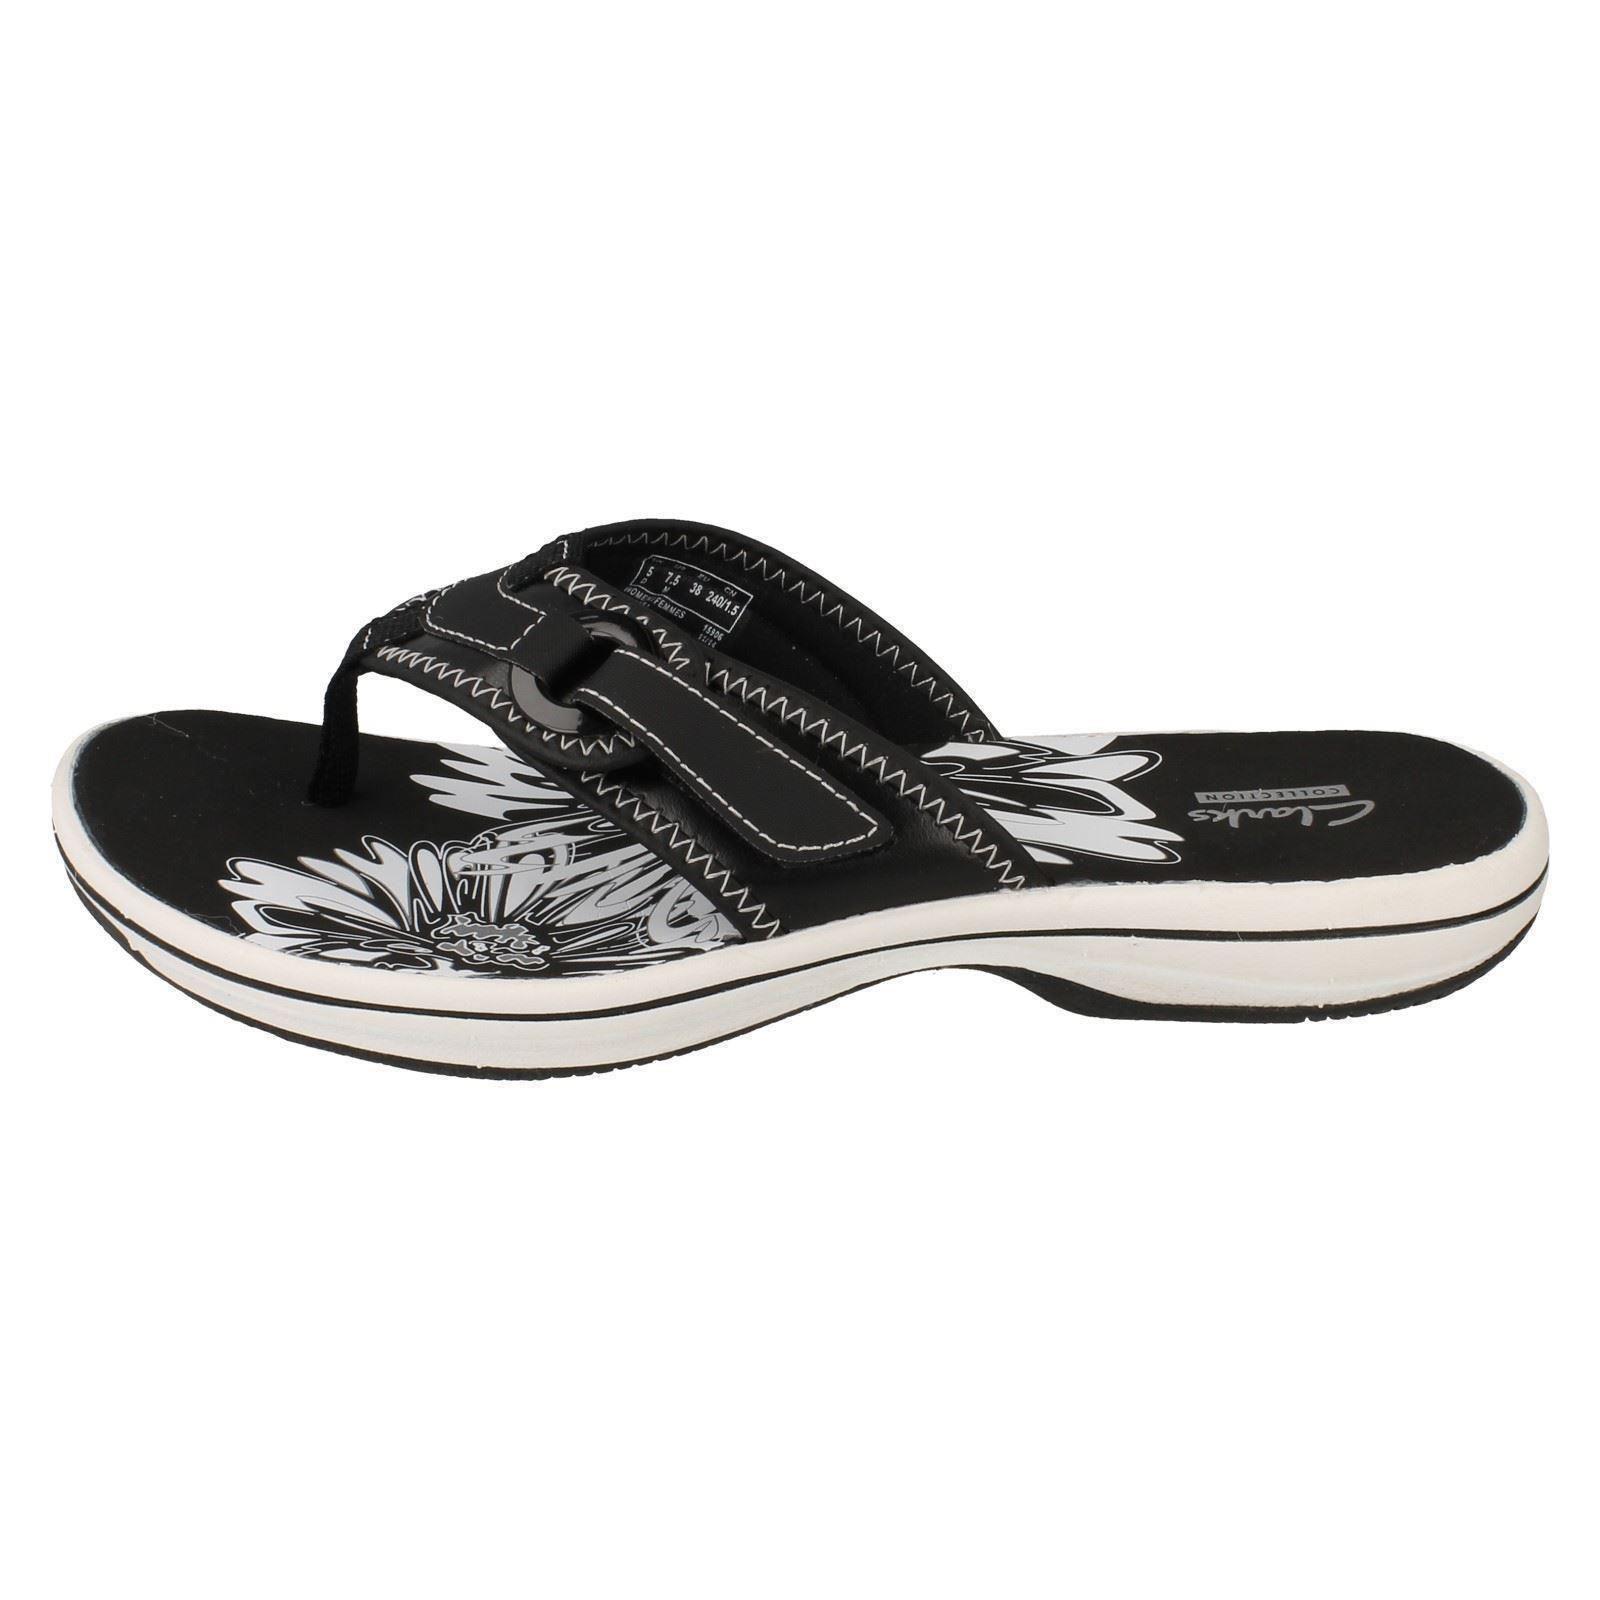 clarks flip flops on sale